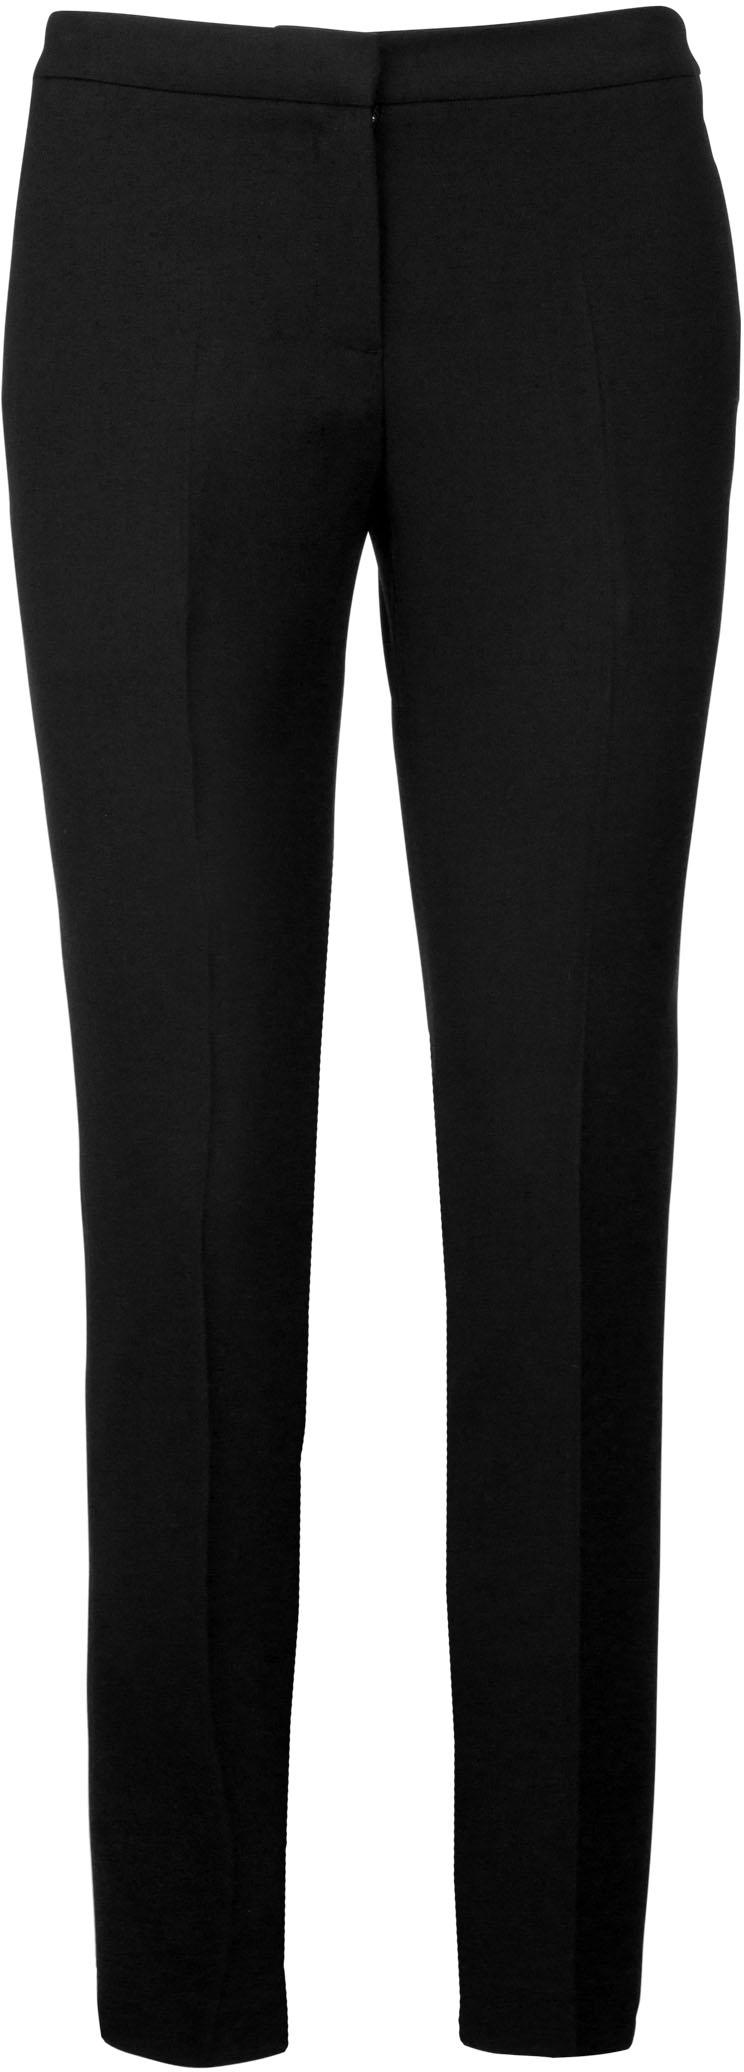 Pantalon femme - 2-1493-4